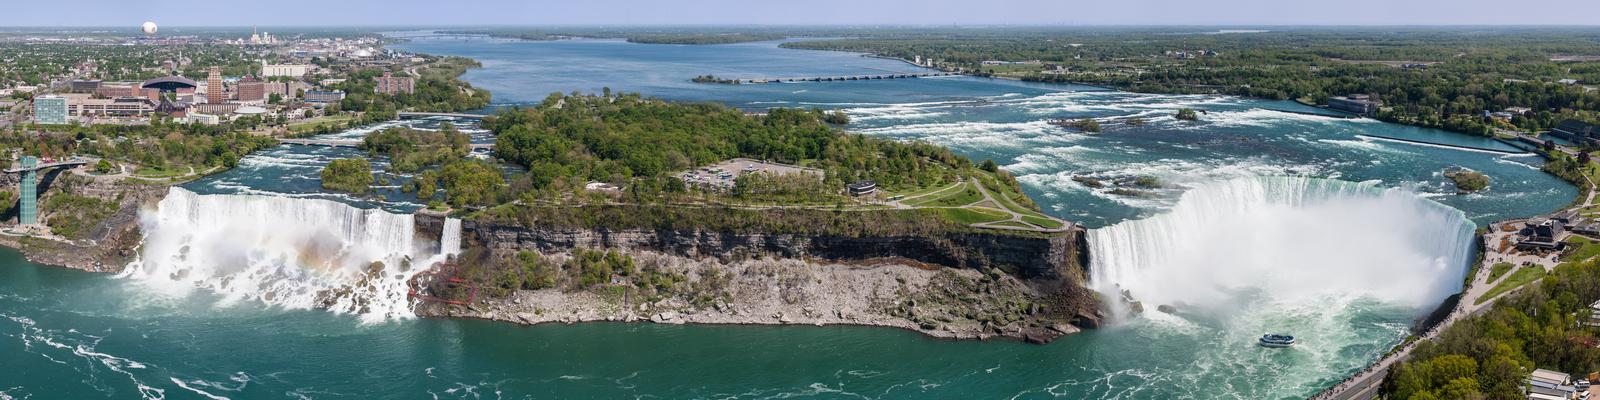 Super Chutes du Niagara - Wikiwand OQ26